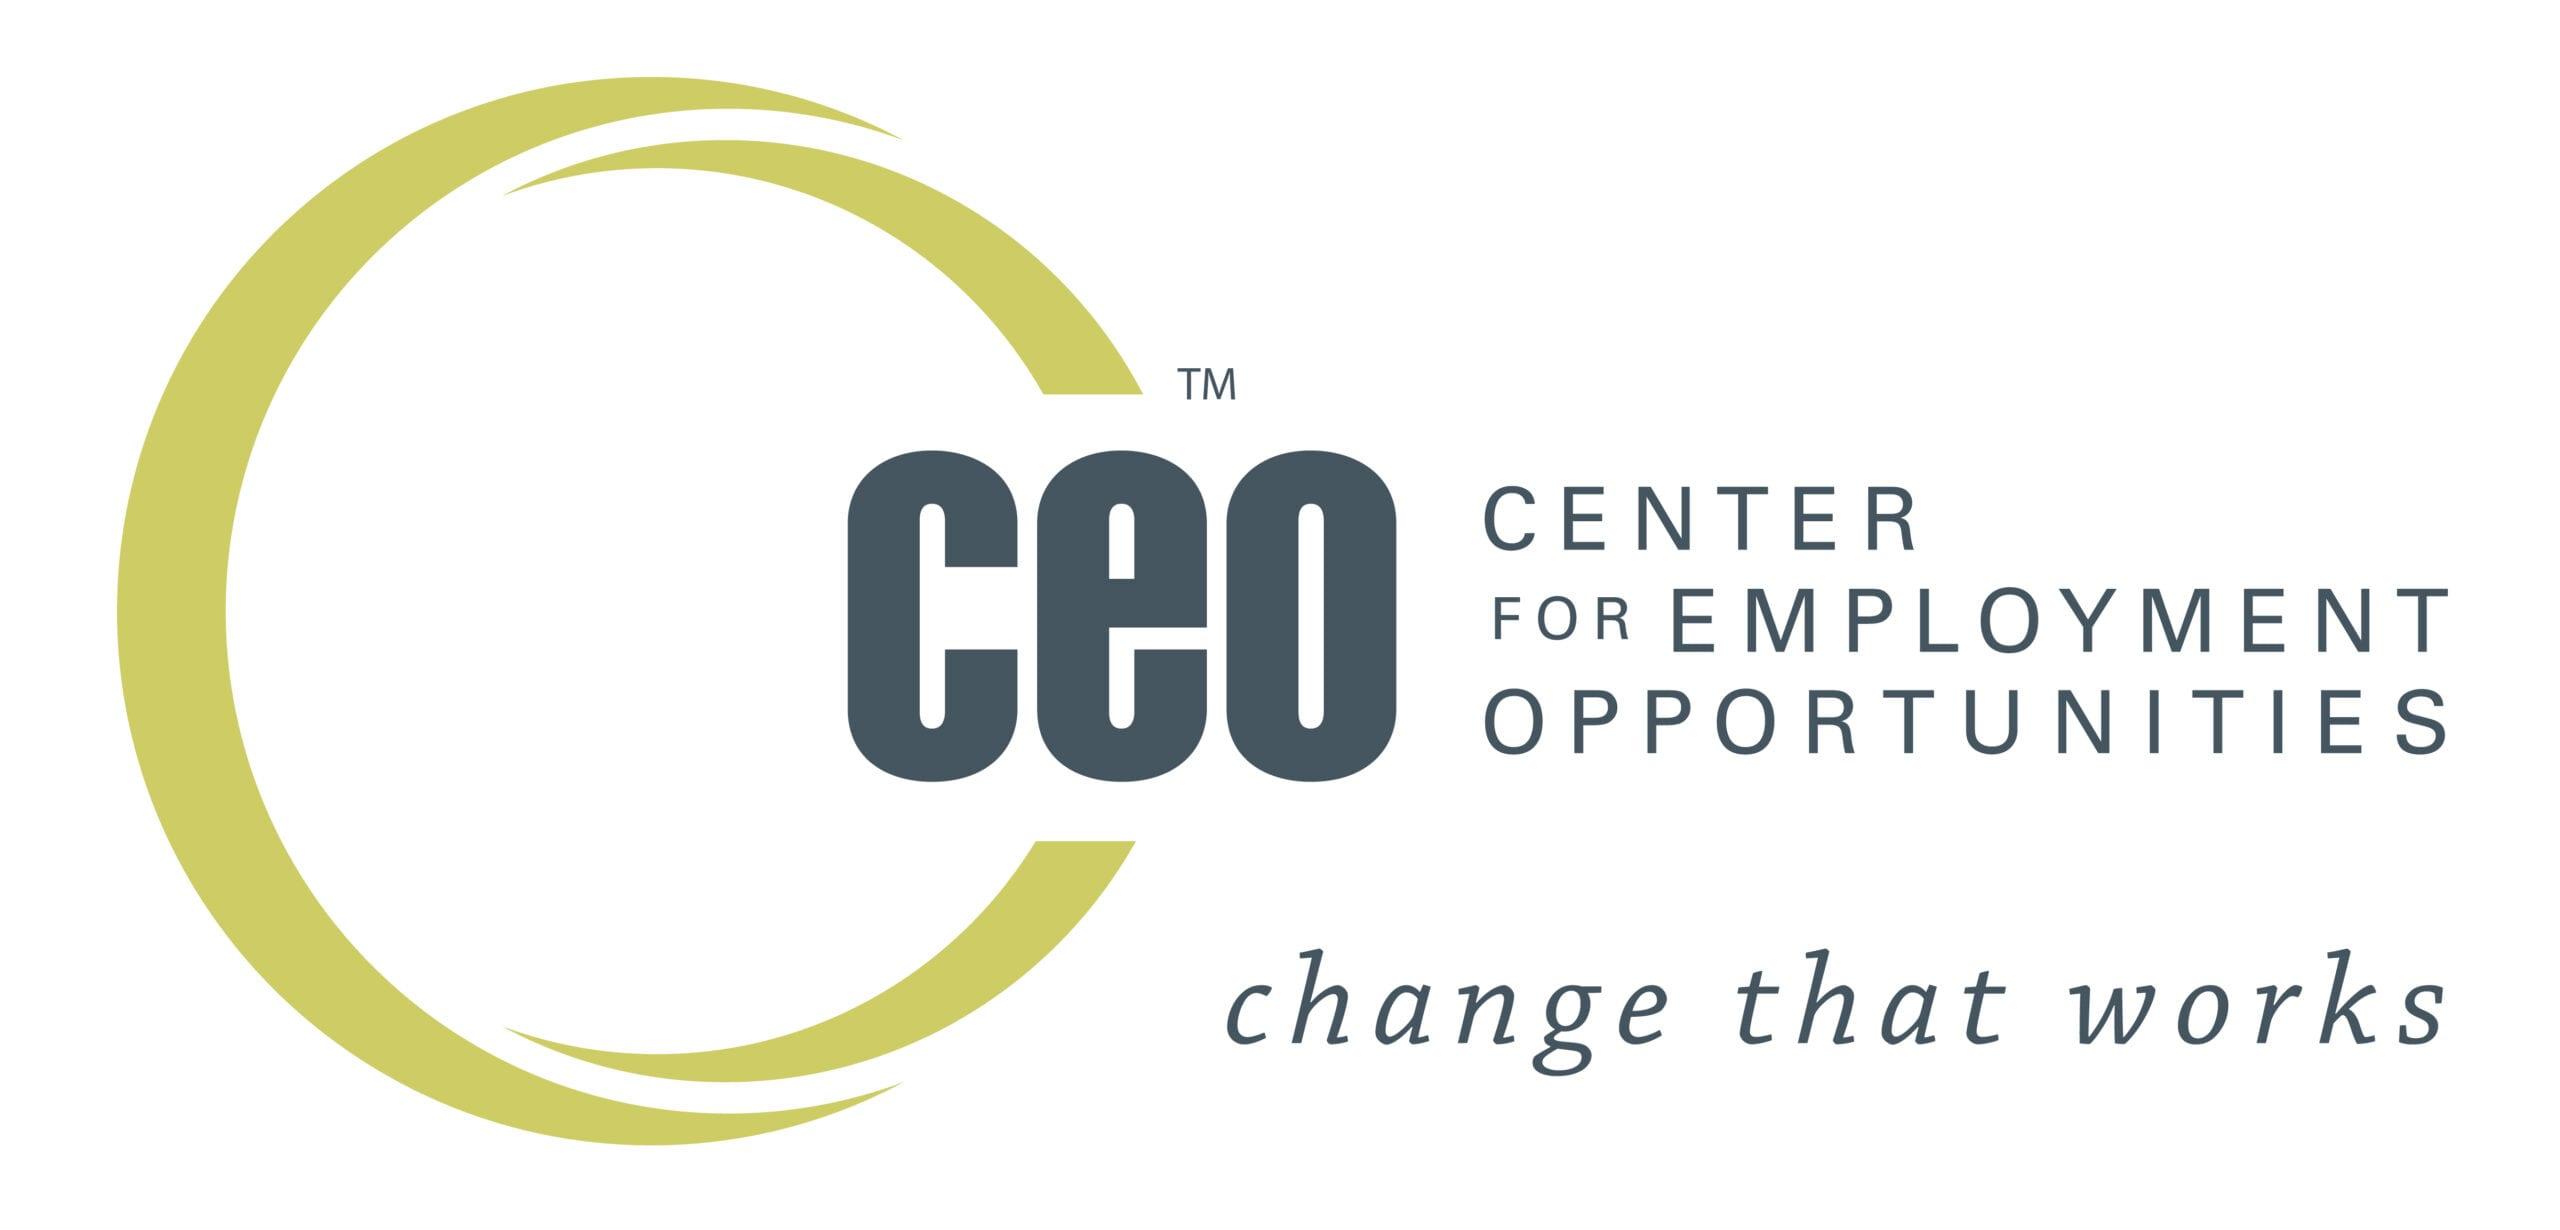 Center for Employment Opportunities logo